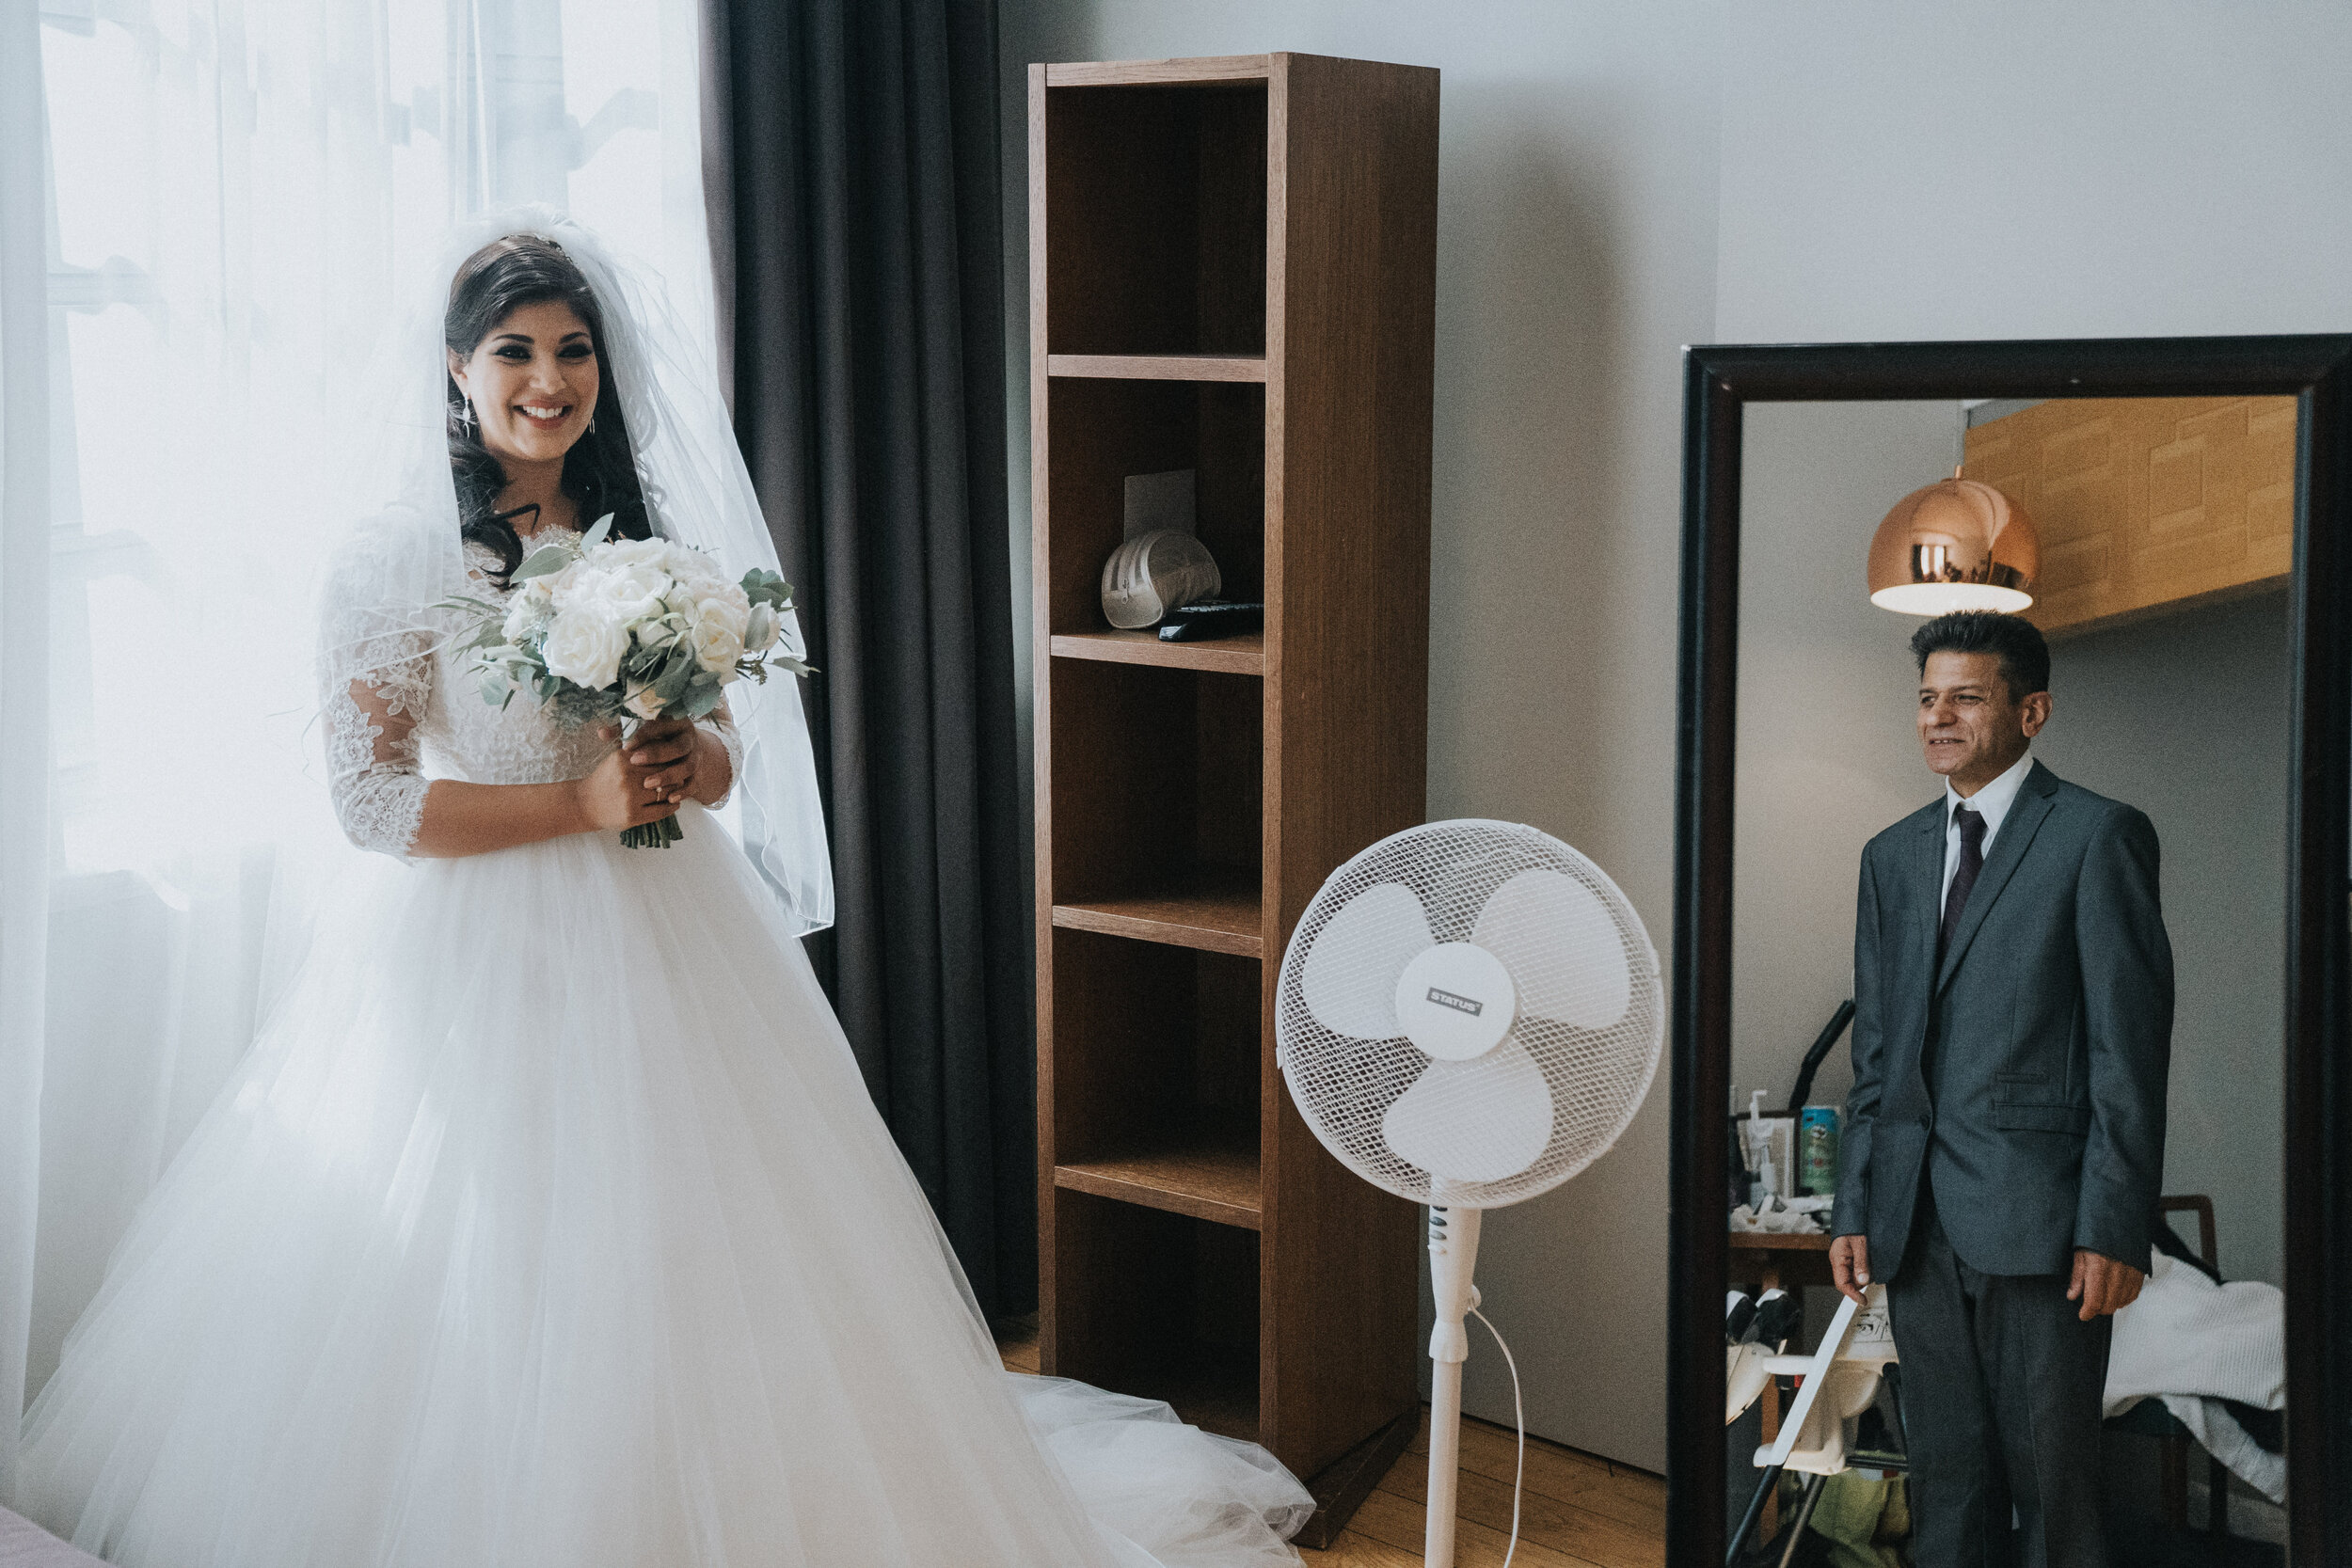 east-london-wedding-photographer-videographer-patriot-square-apartments-24